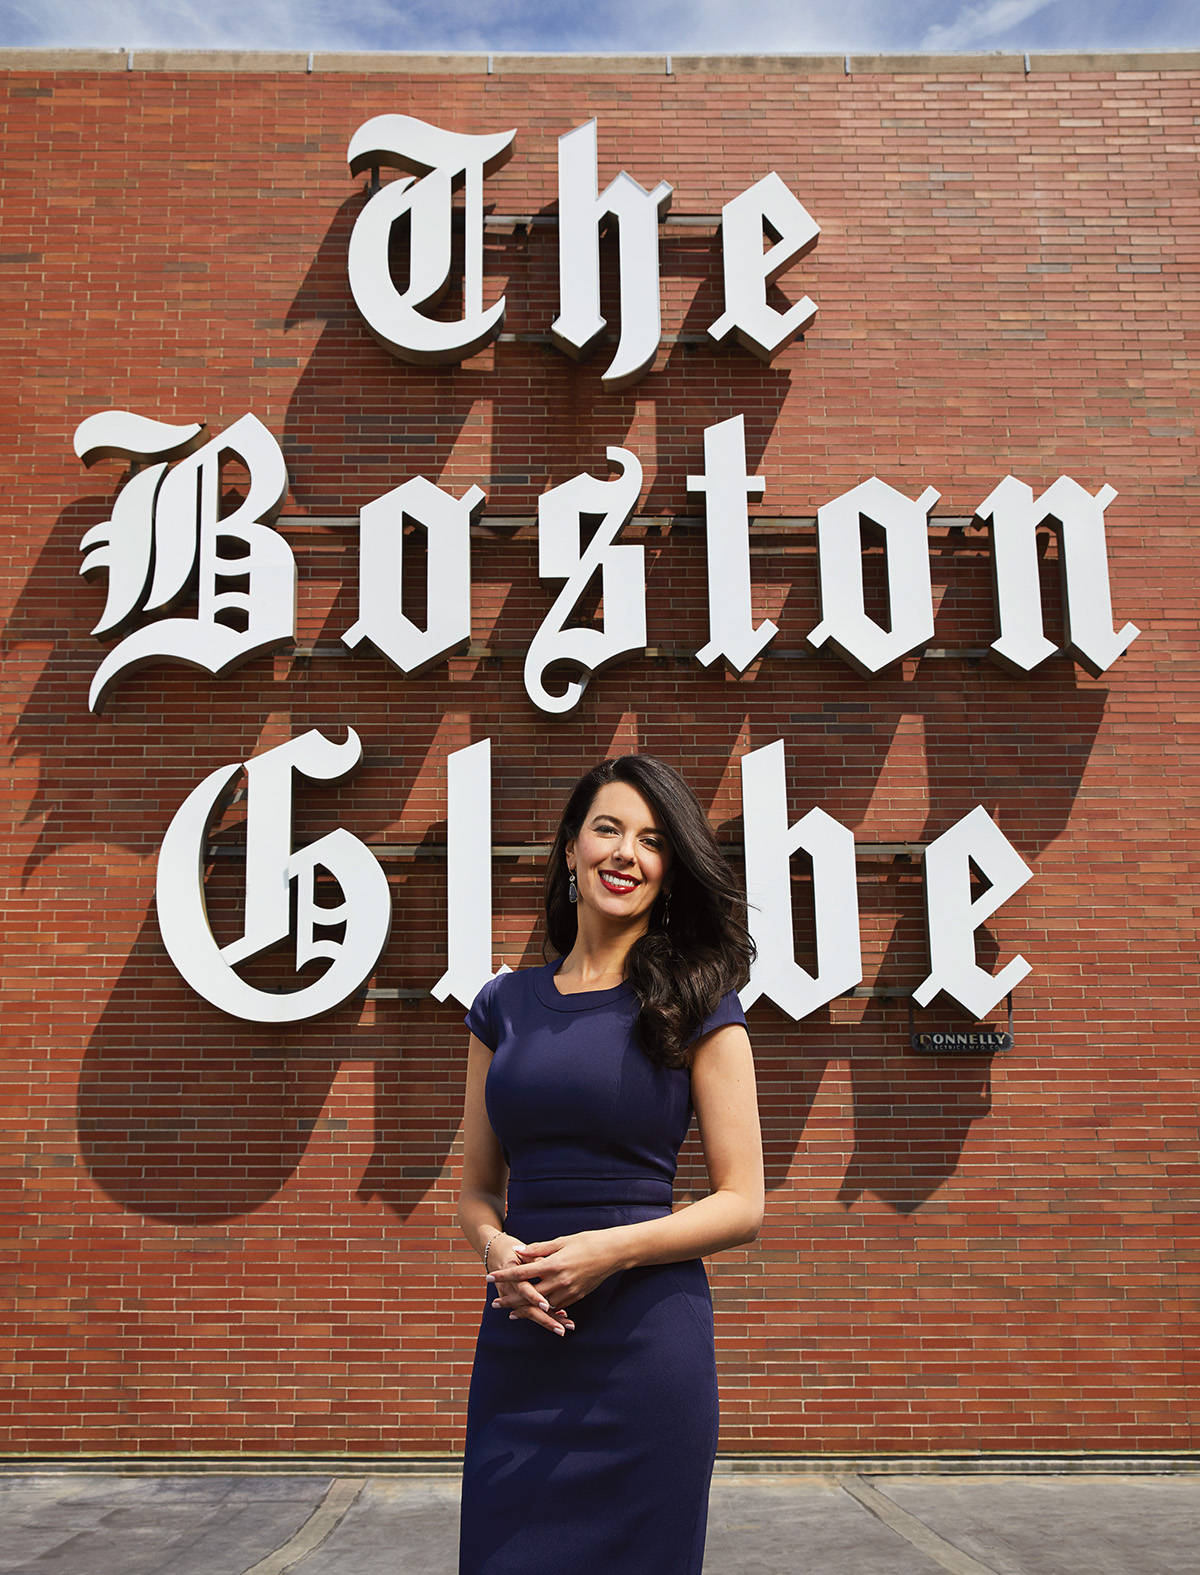 linda pizzuti henry boston globe